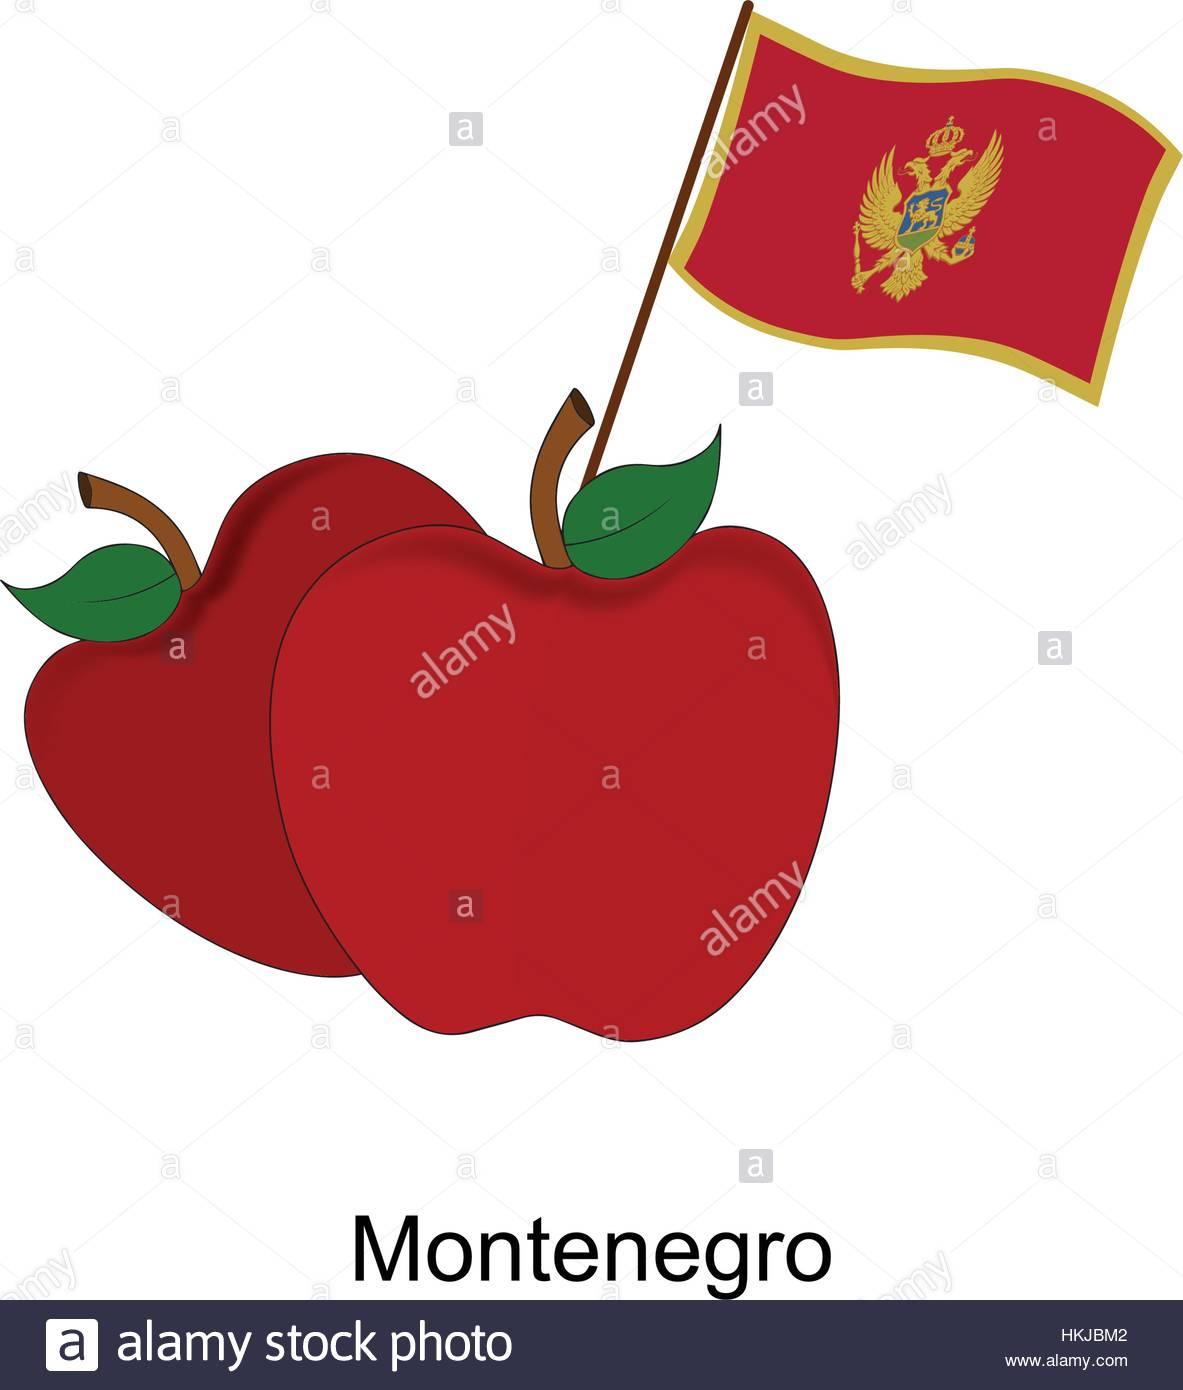 Illustration of Apple, Montenegro Flag, Apple with Montenegro Flag Stock Vector